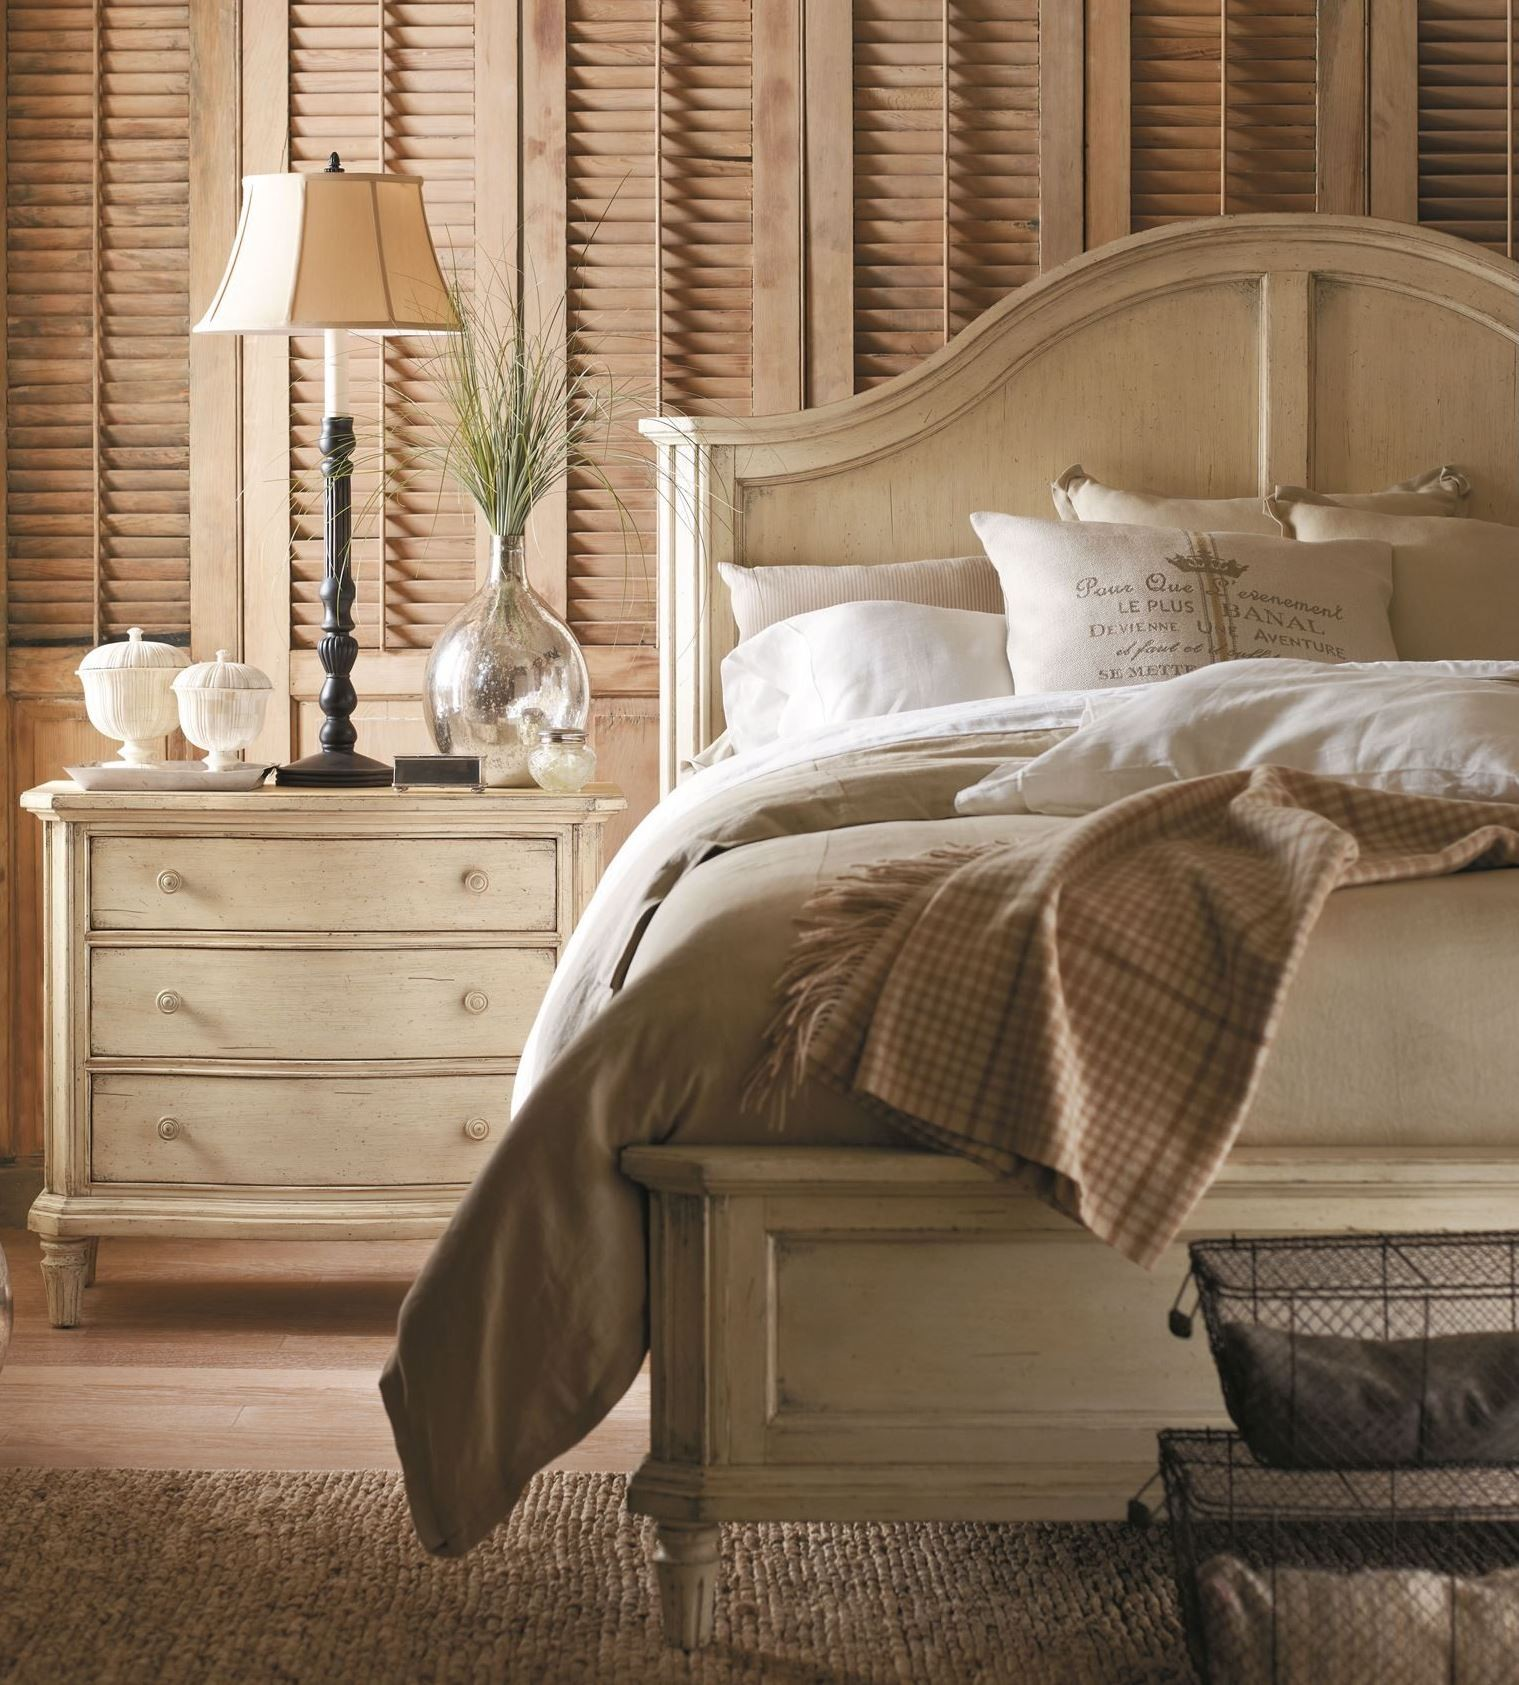 European Cottage Vintage White Panel Bedroom Set from Stanley (007-23 ...